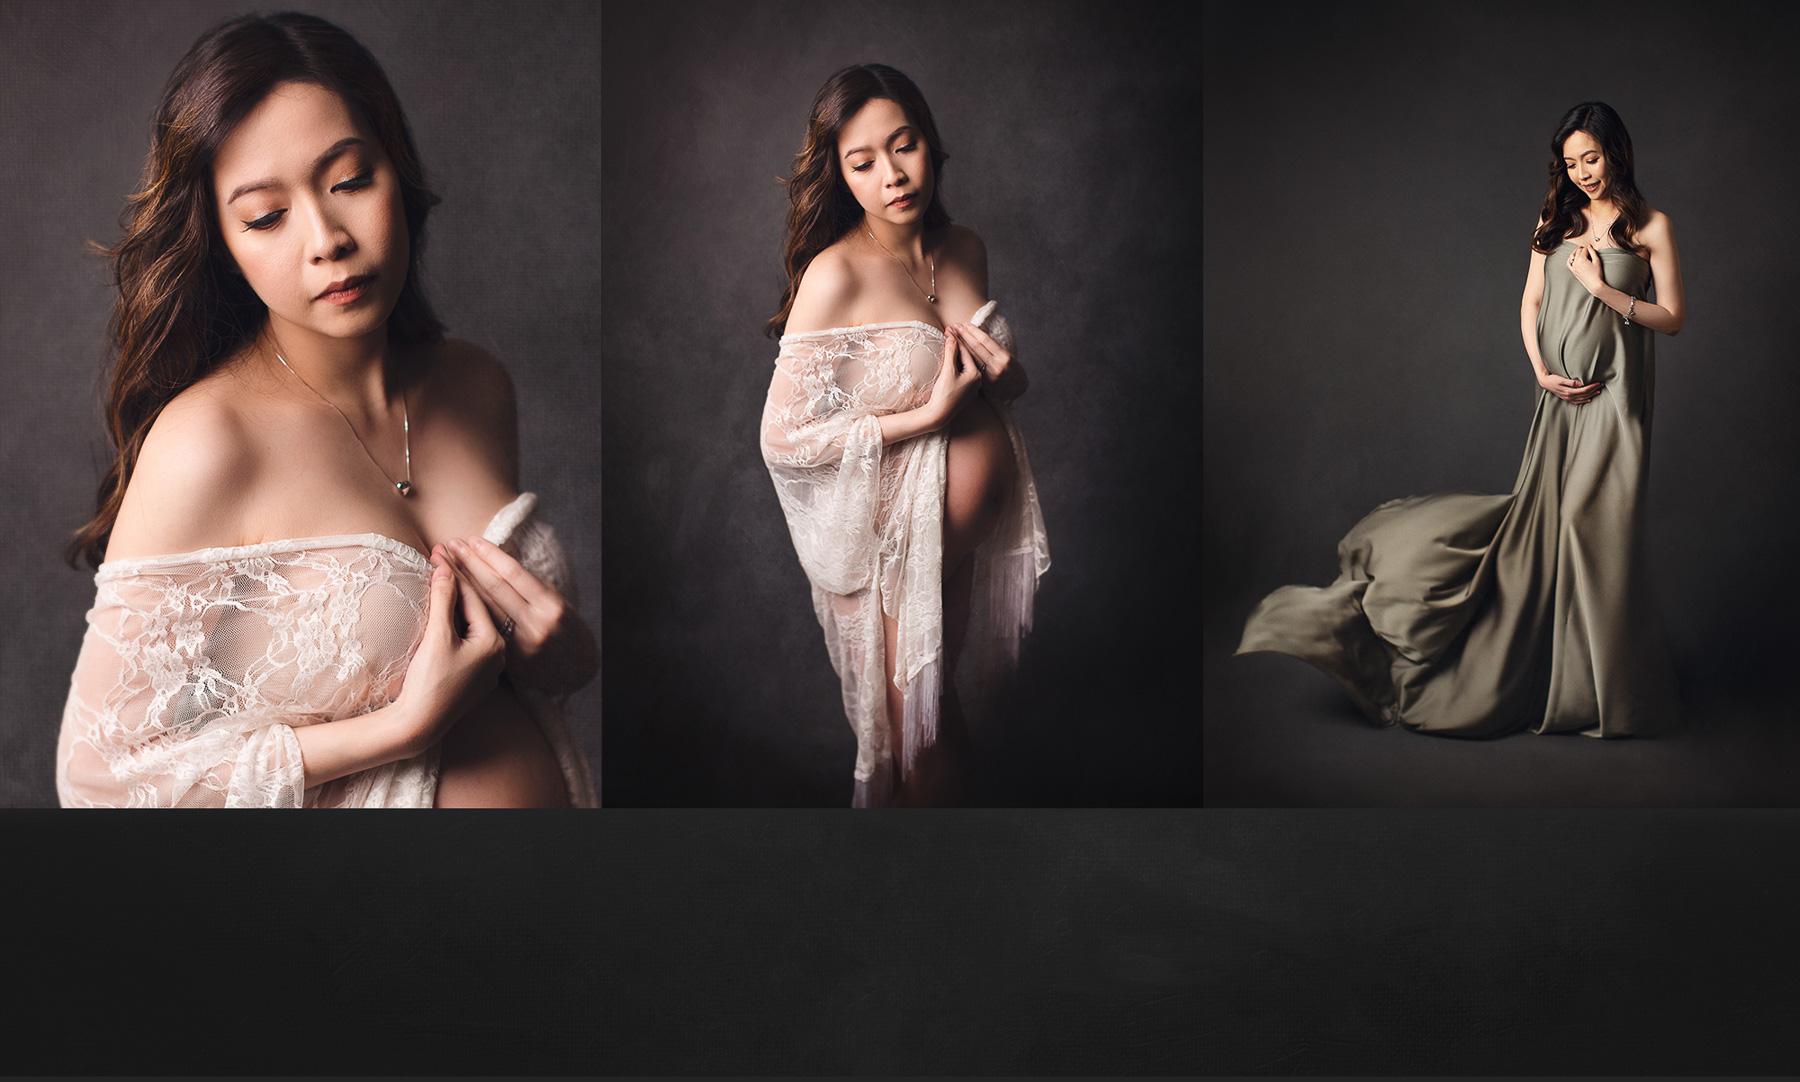 vancouver maternity photography service